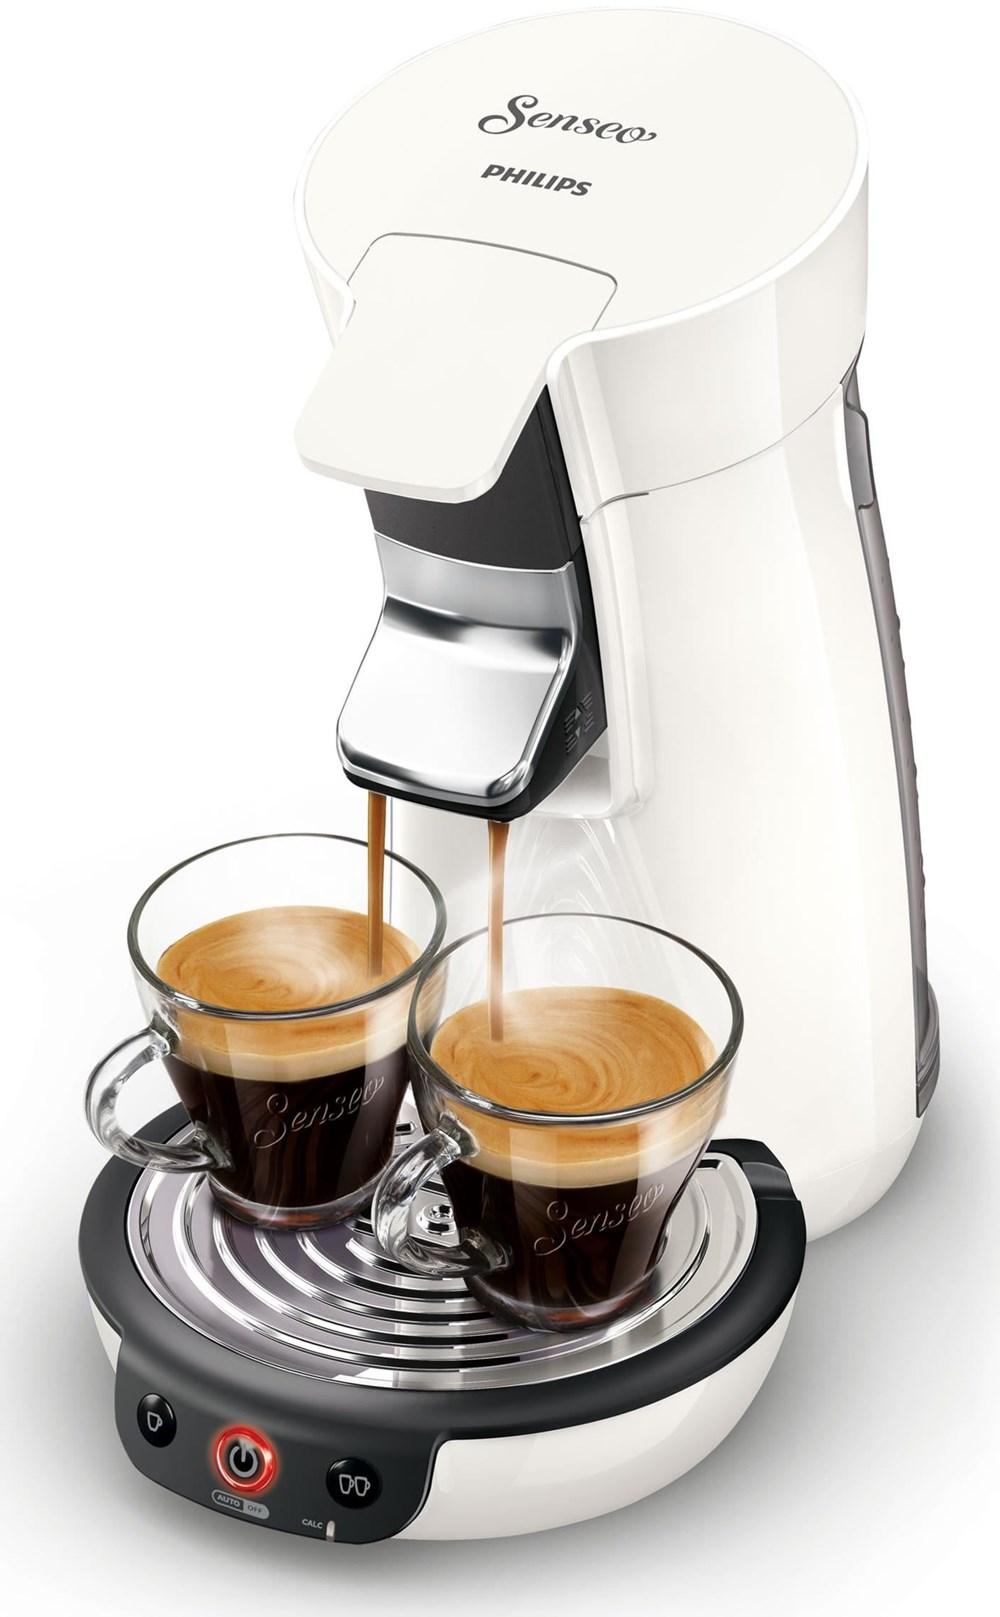 philips senseo viva caf coffee pod machine hd7829 white. Black Bedroom Furniture Sets. Home Design Ideas